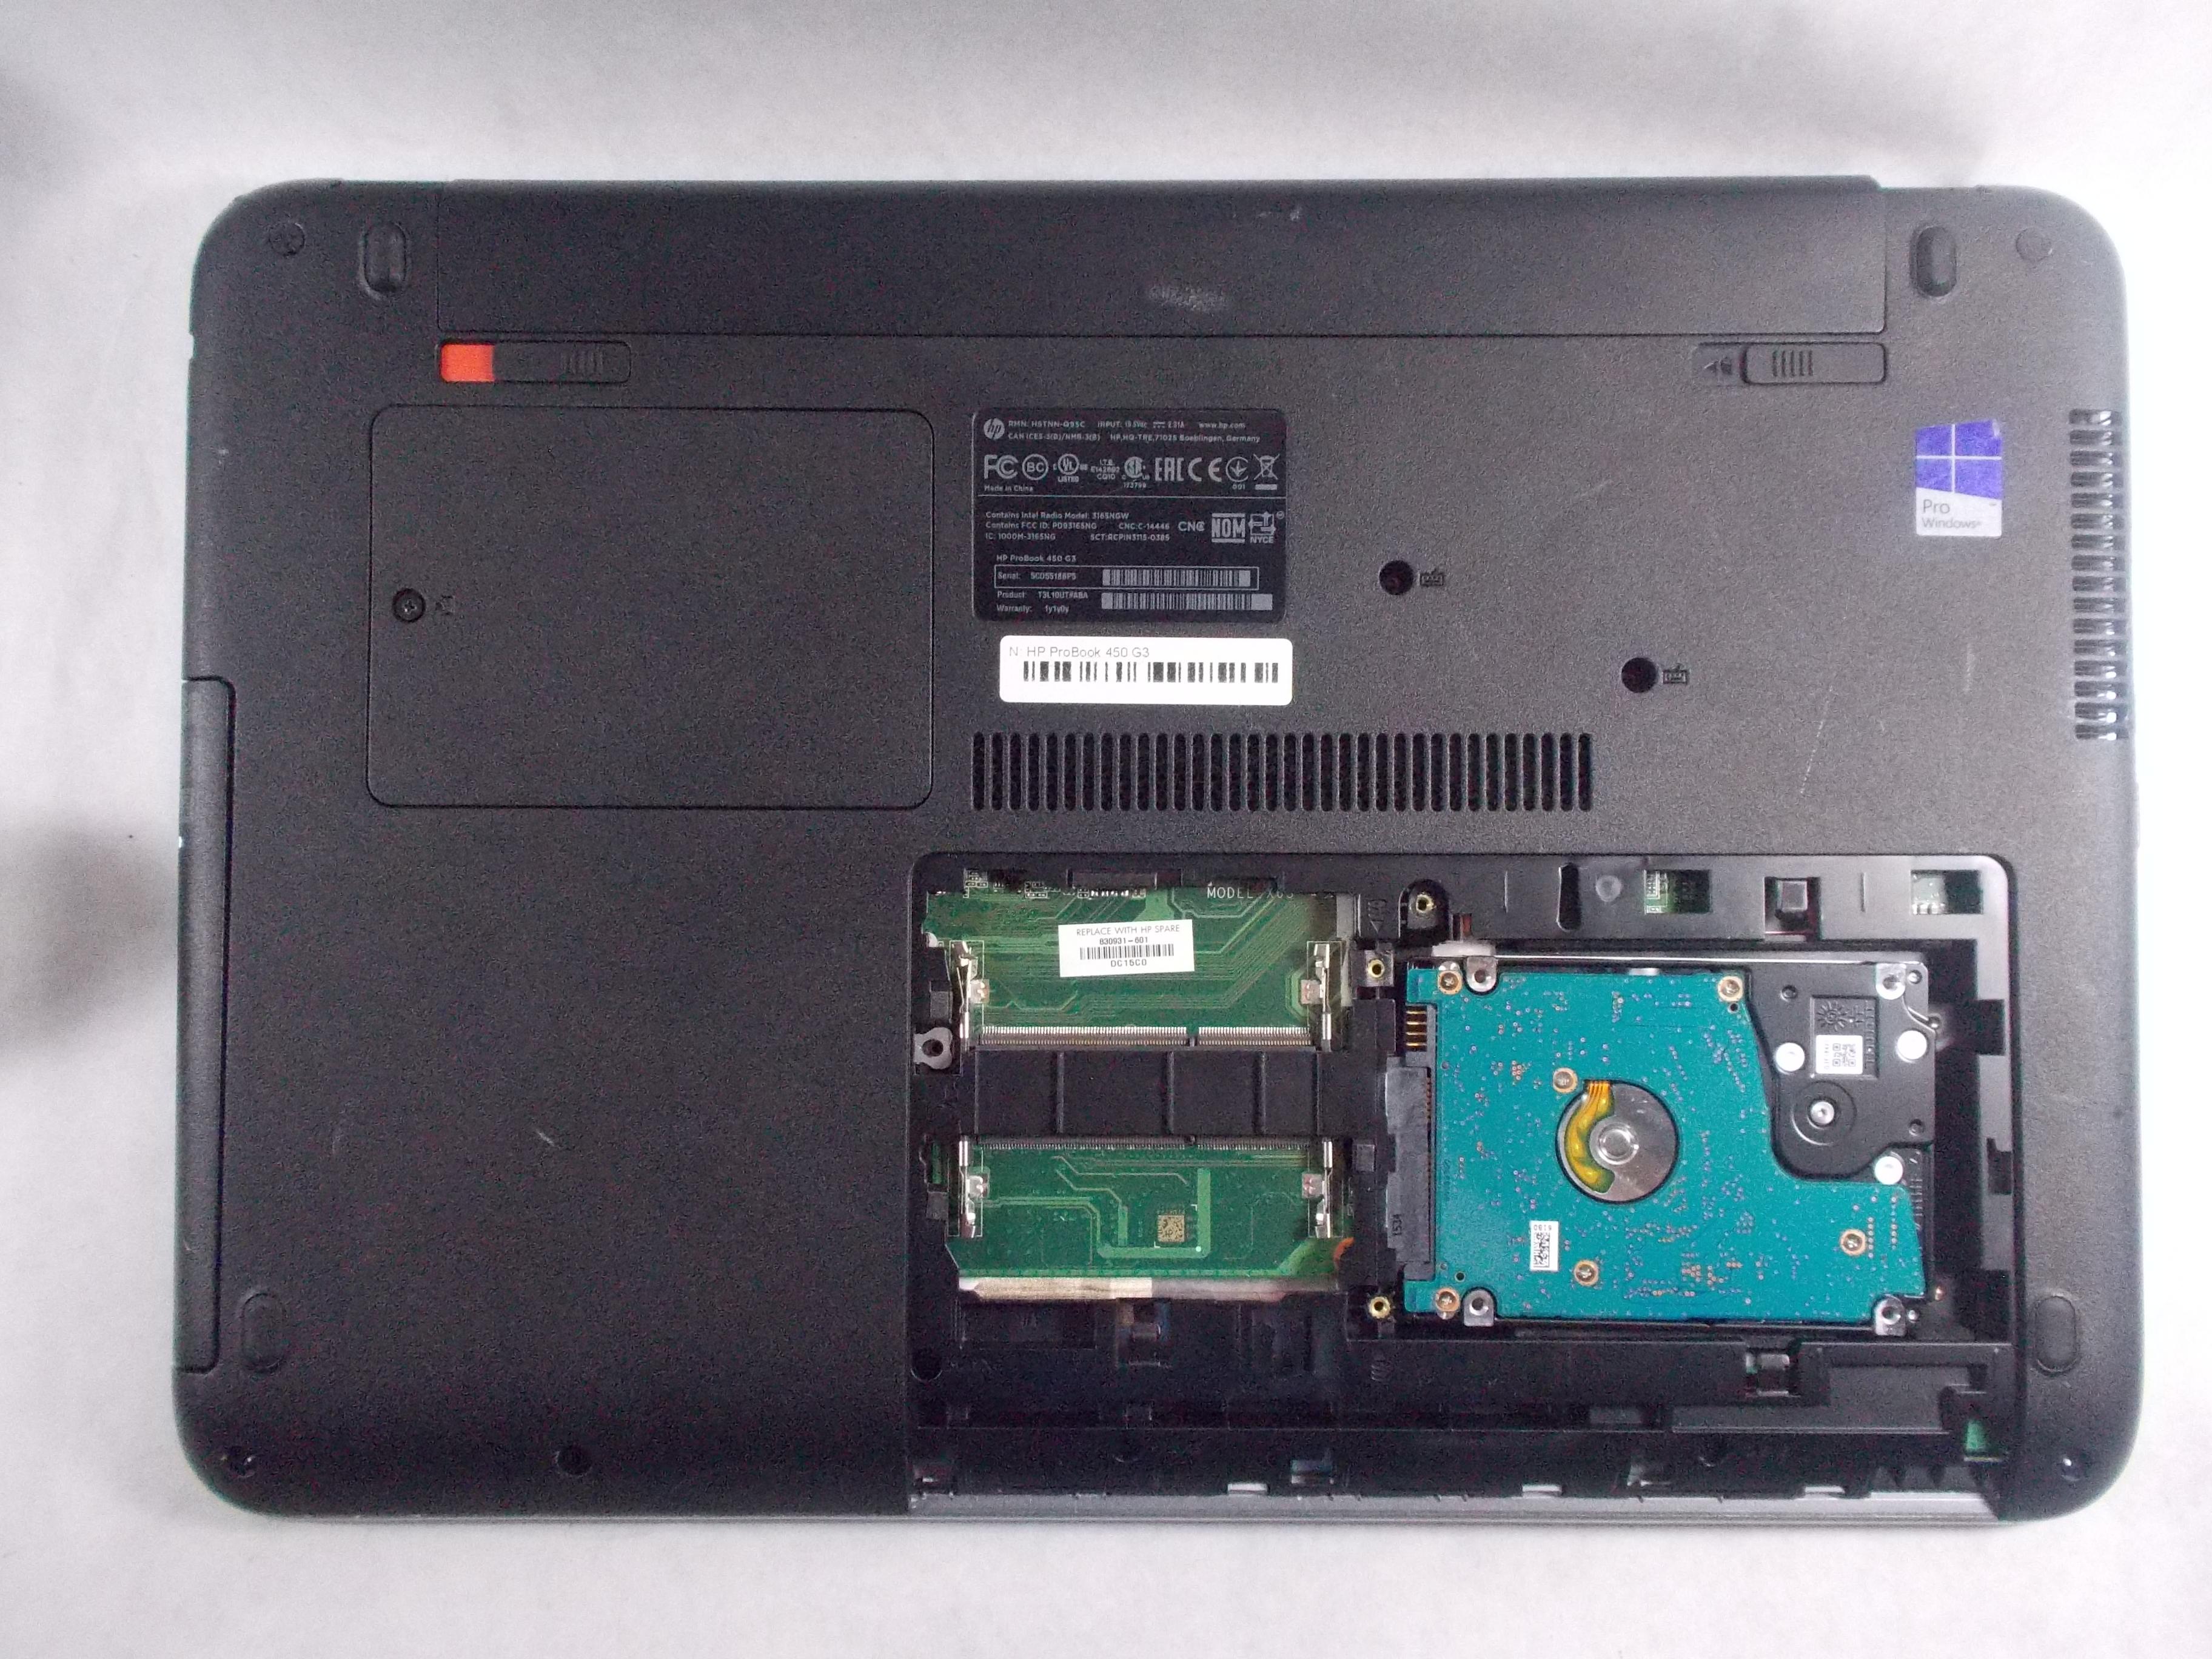 HP ProBook 450 G3 Repair - iFixit